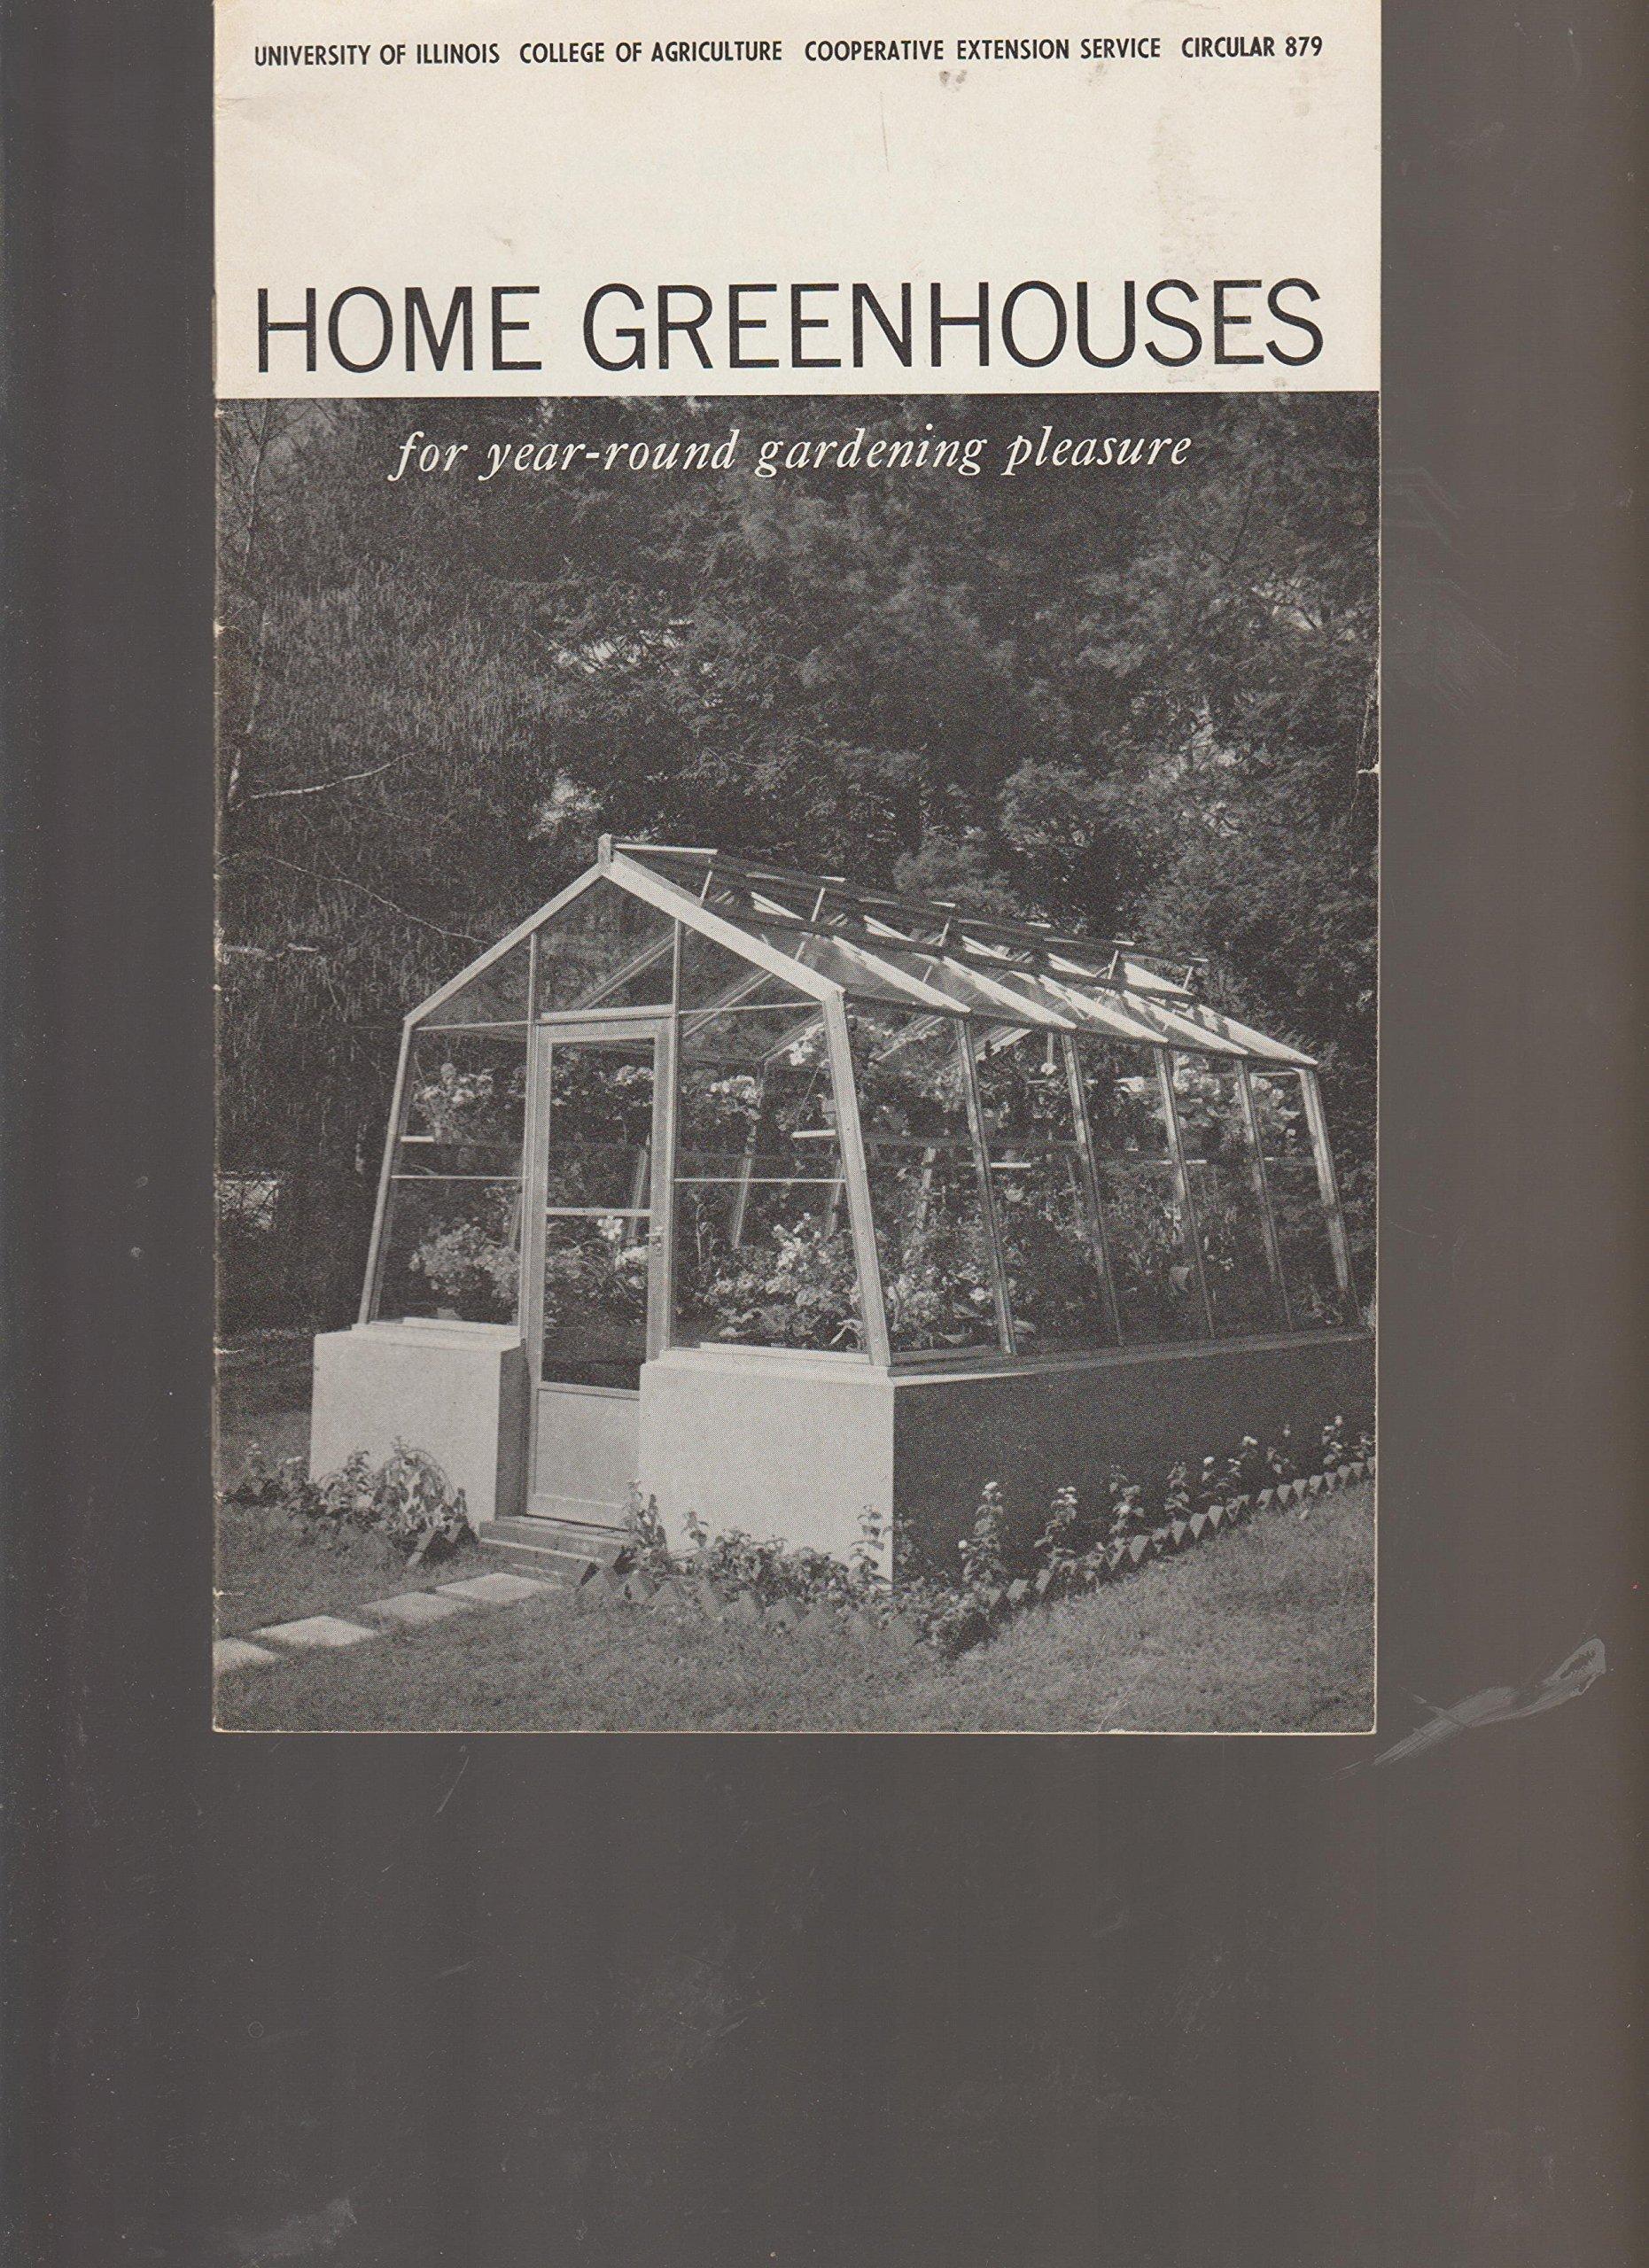 HOME GREENHOUSES FOR YEAR-ROUND GARDENING PLEASURE